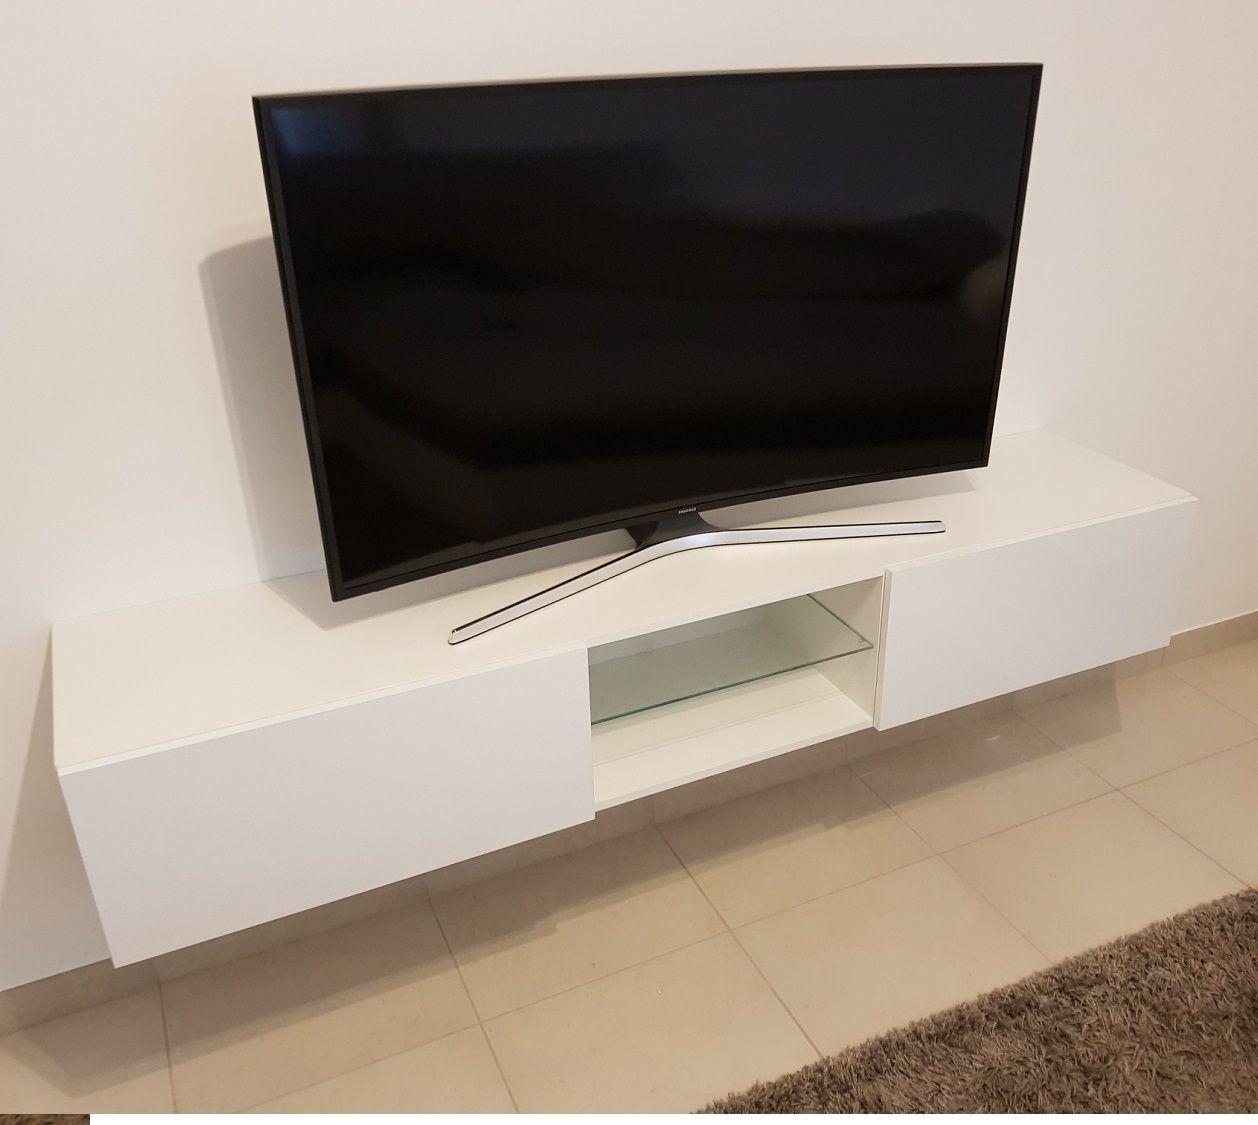 Tv Meubel 180 Cm Breed.Modern Zwevend Tv Meubel Bobbie Glas 180 Cm Breed Uitgevoerd In